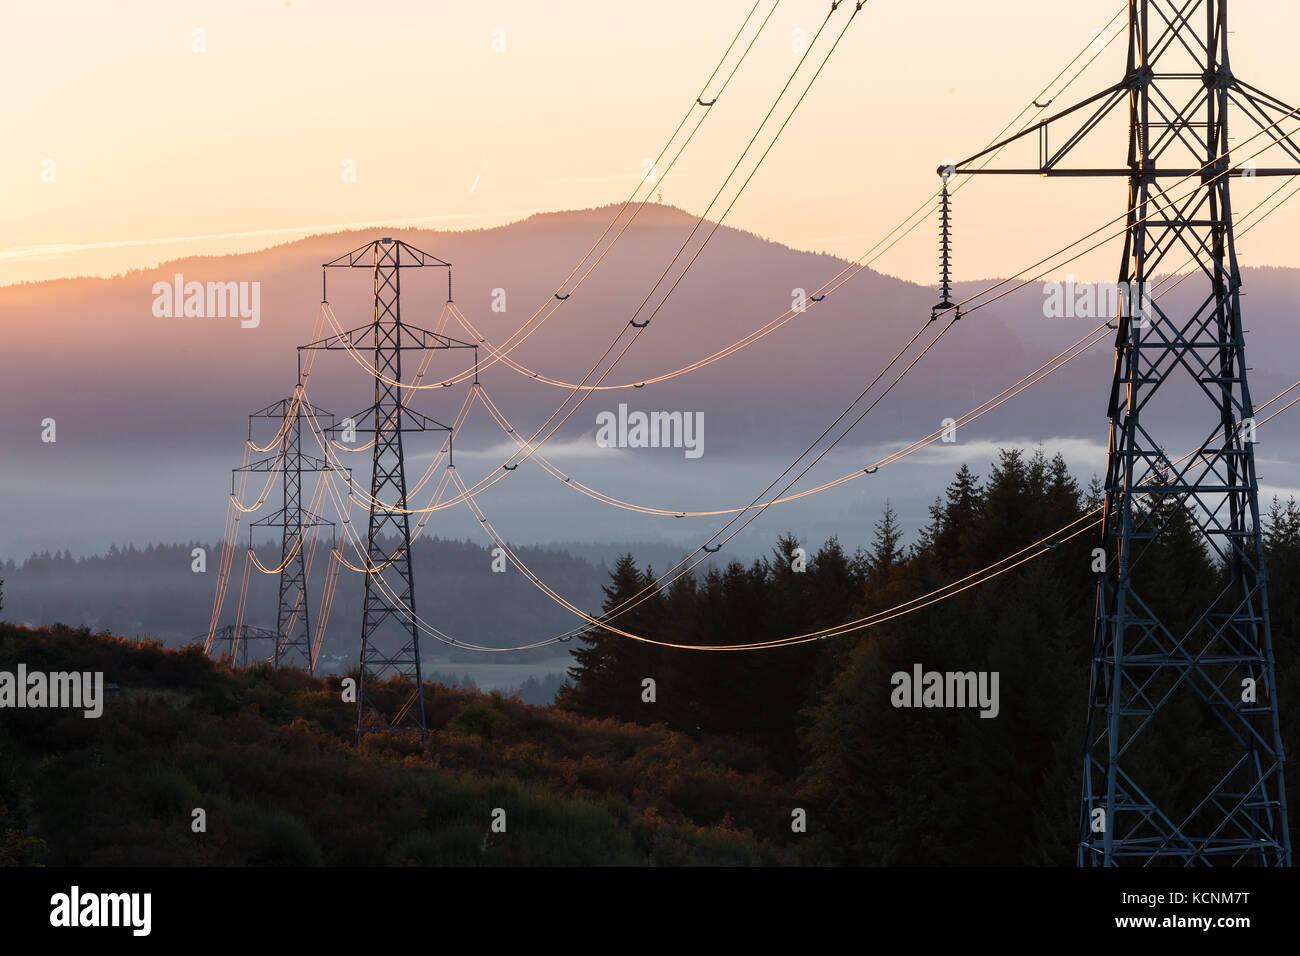 Líneas eléctricas de alta tensión están iluminados por un amanecer temprano. Duncan, isla de Imagen De Stock